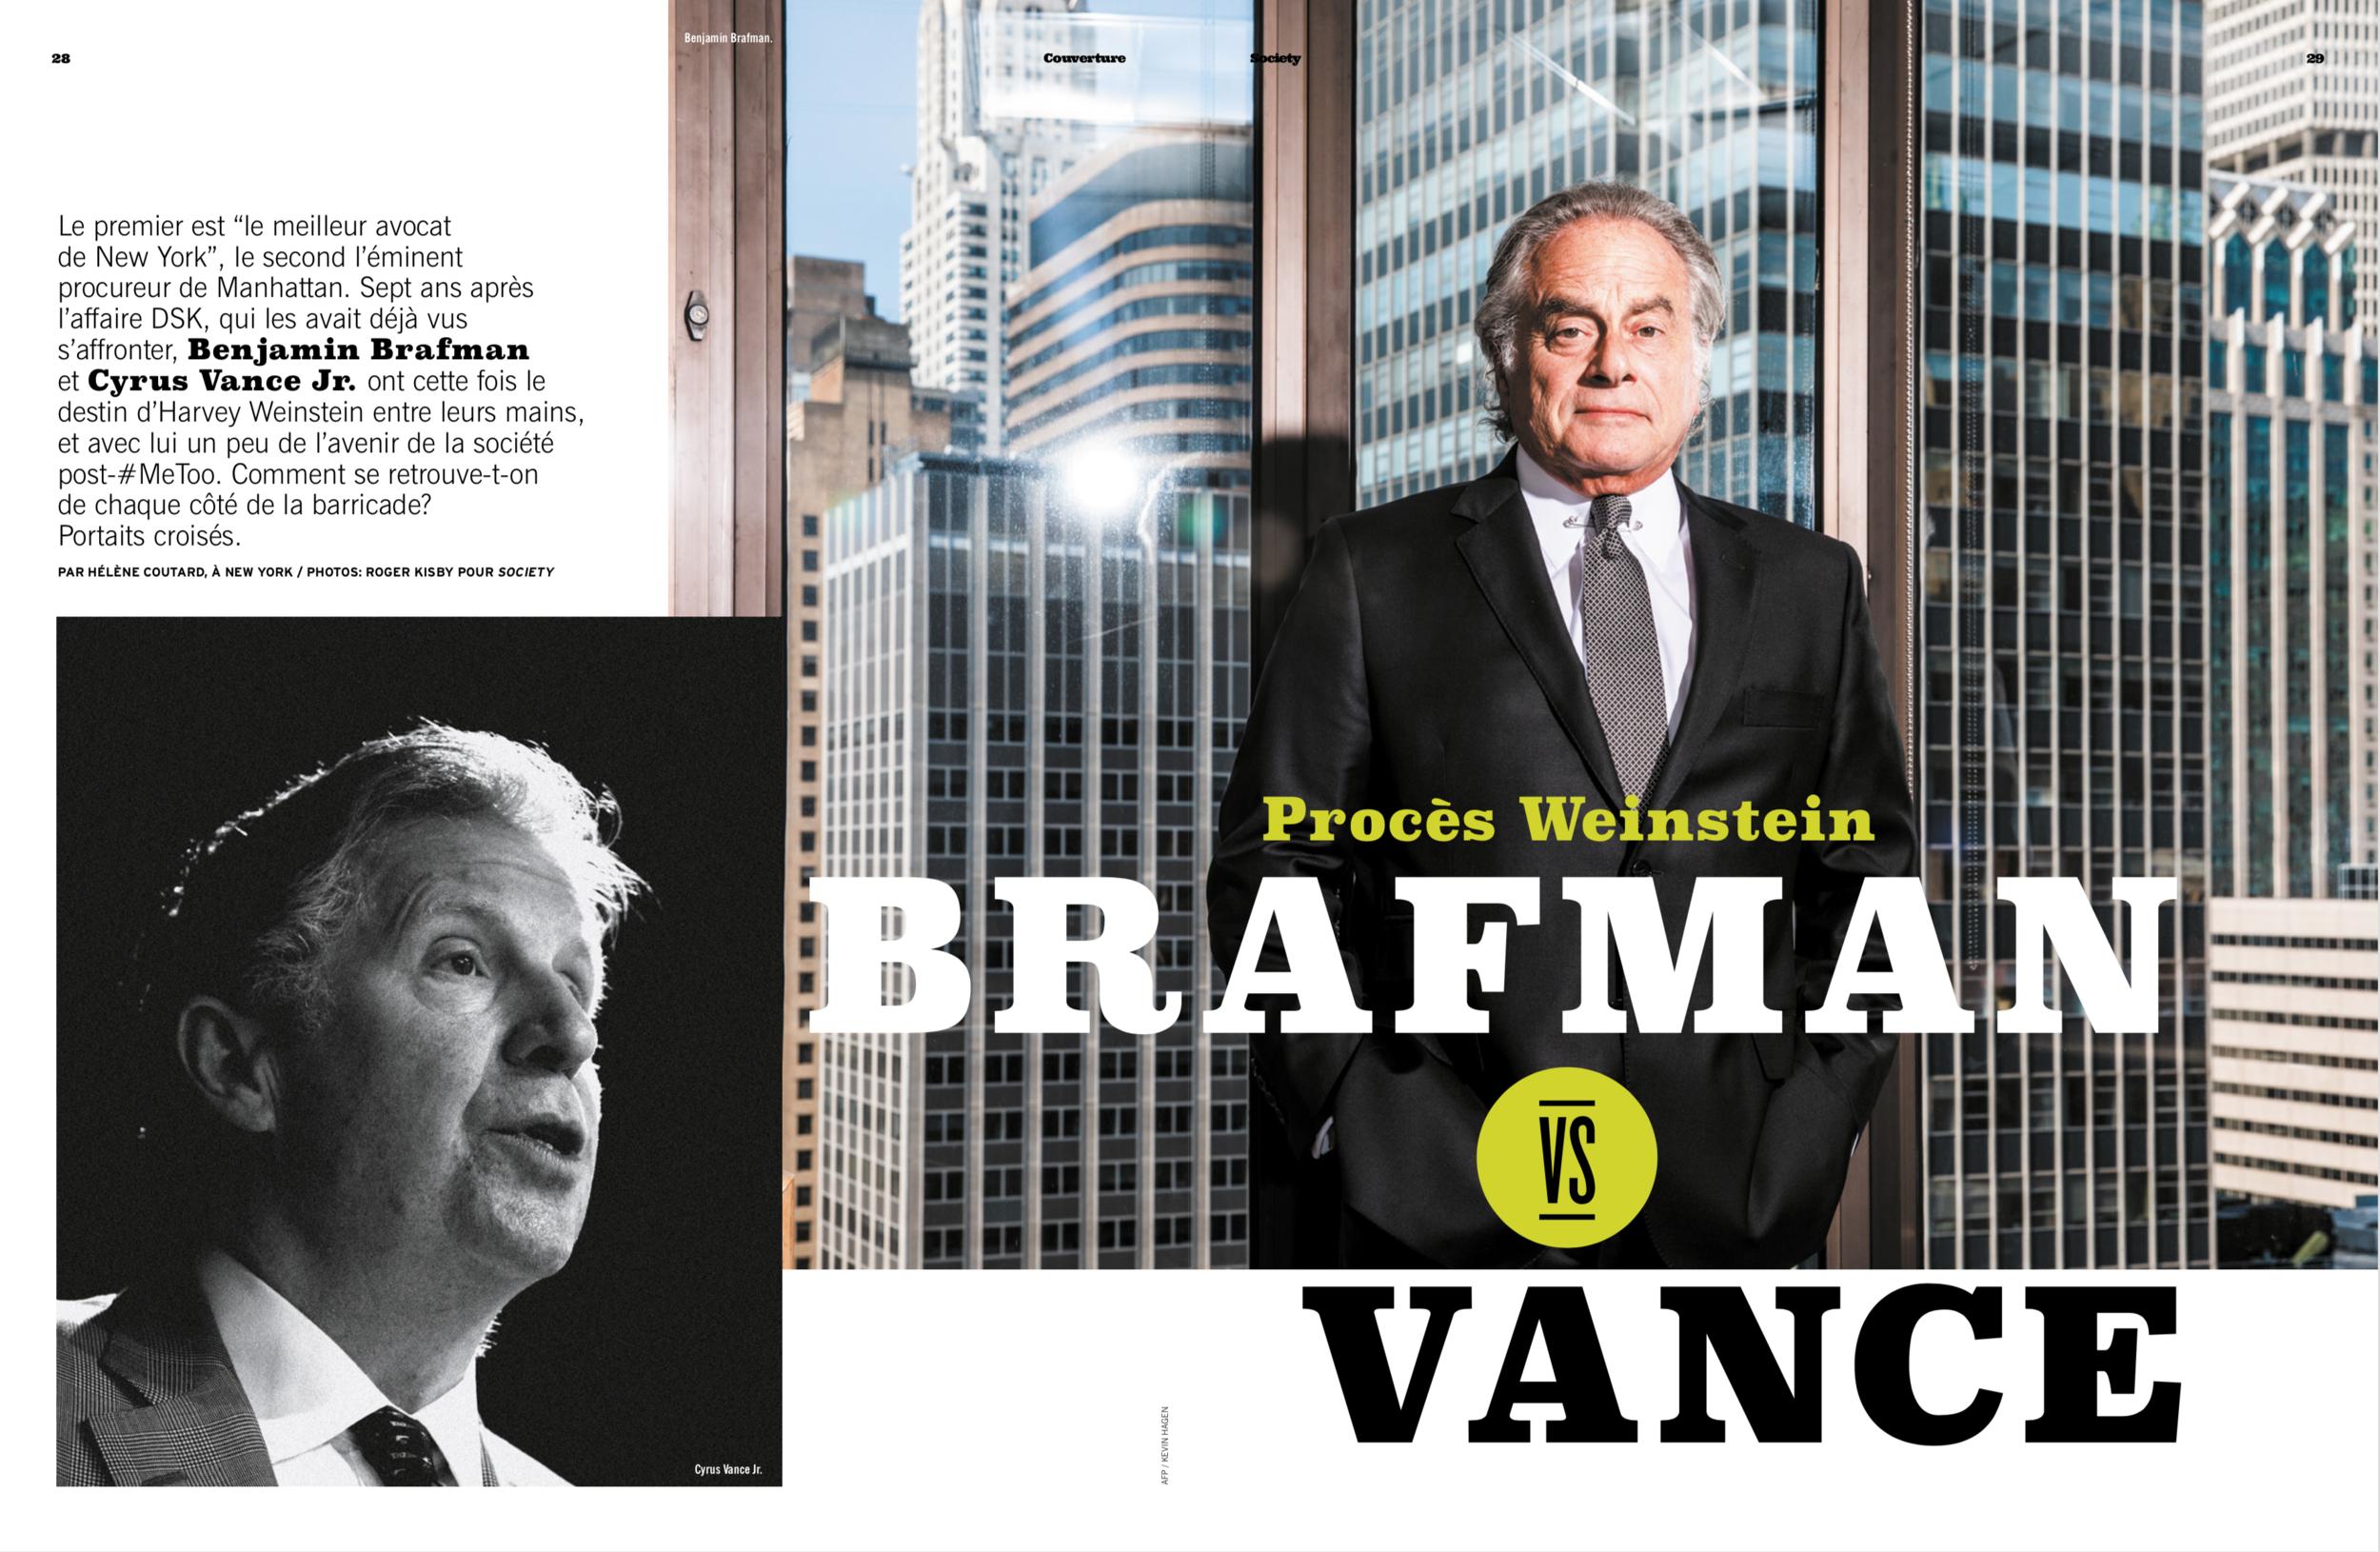 Benjamin Brafman for Society Magazine